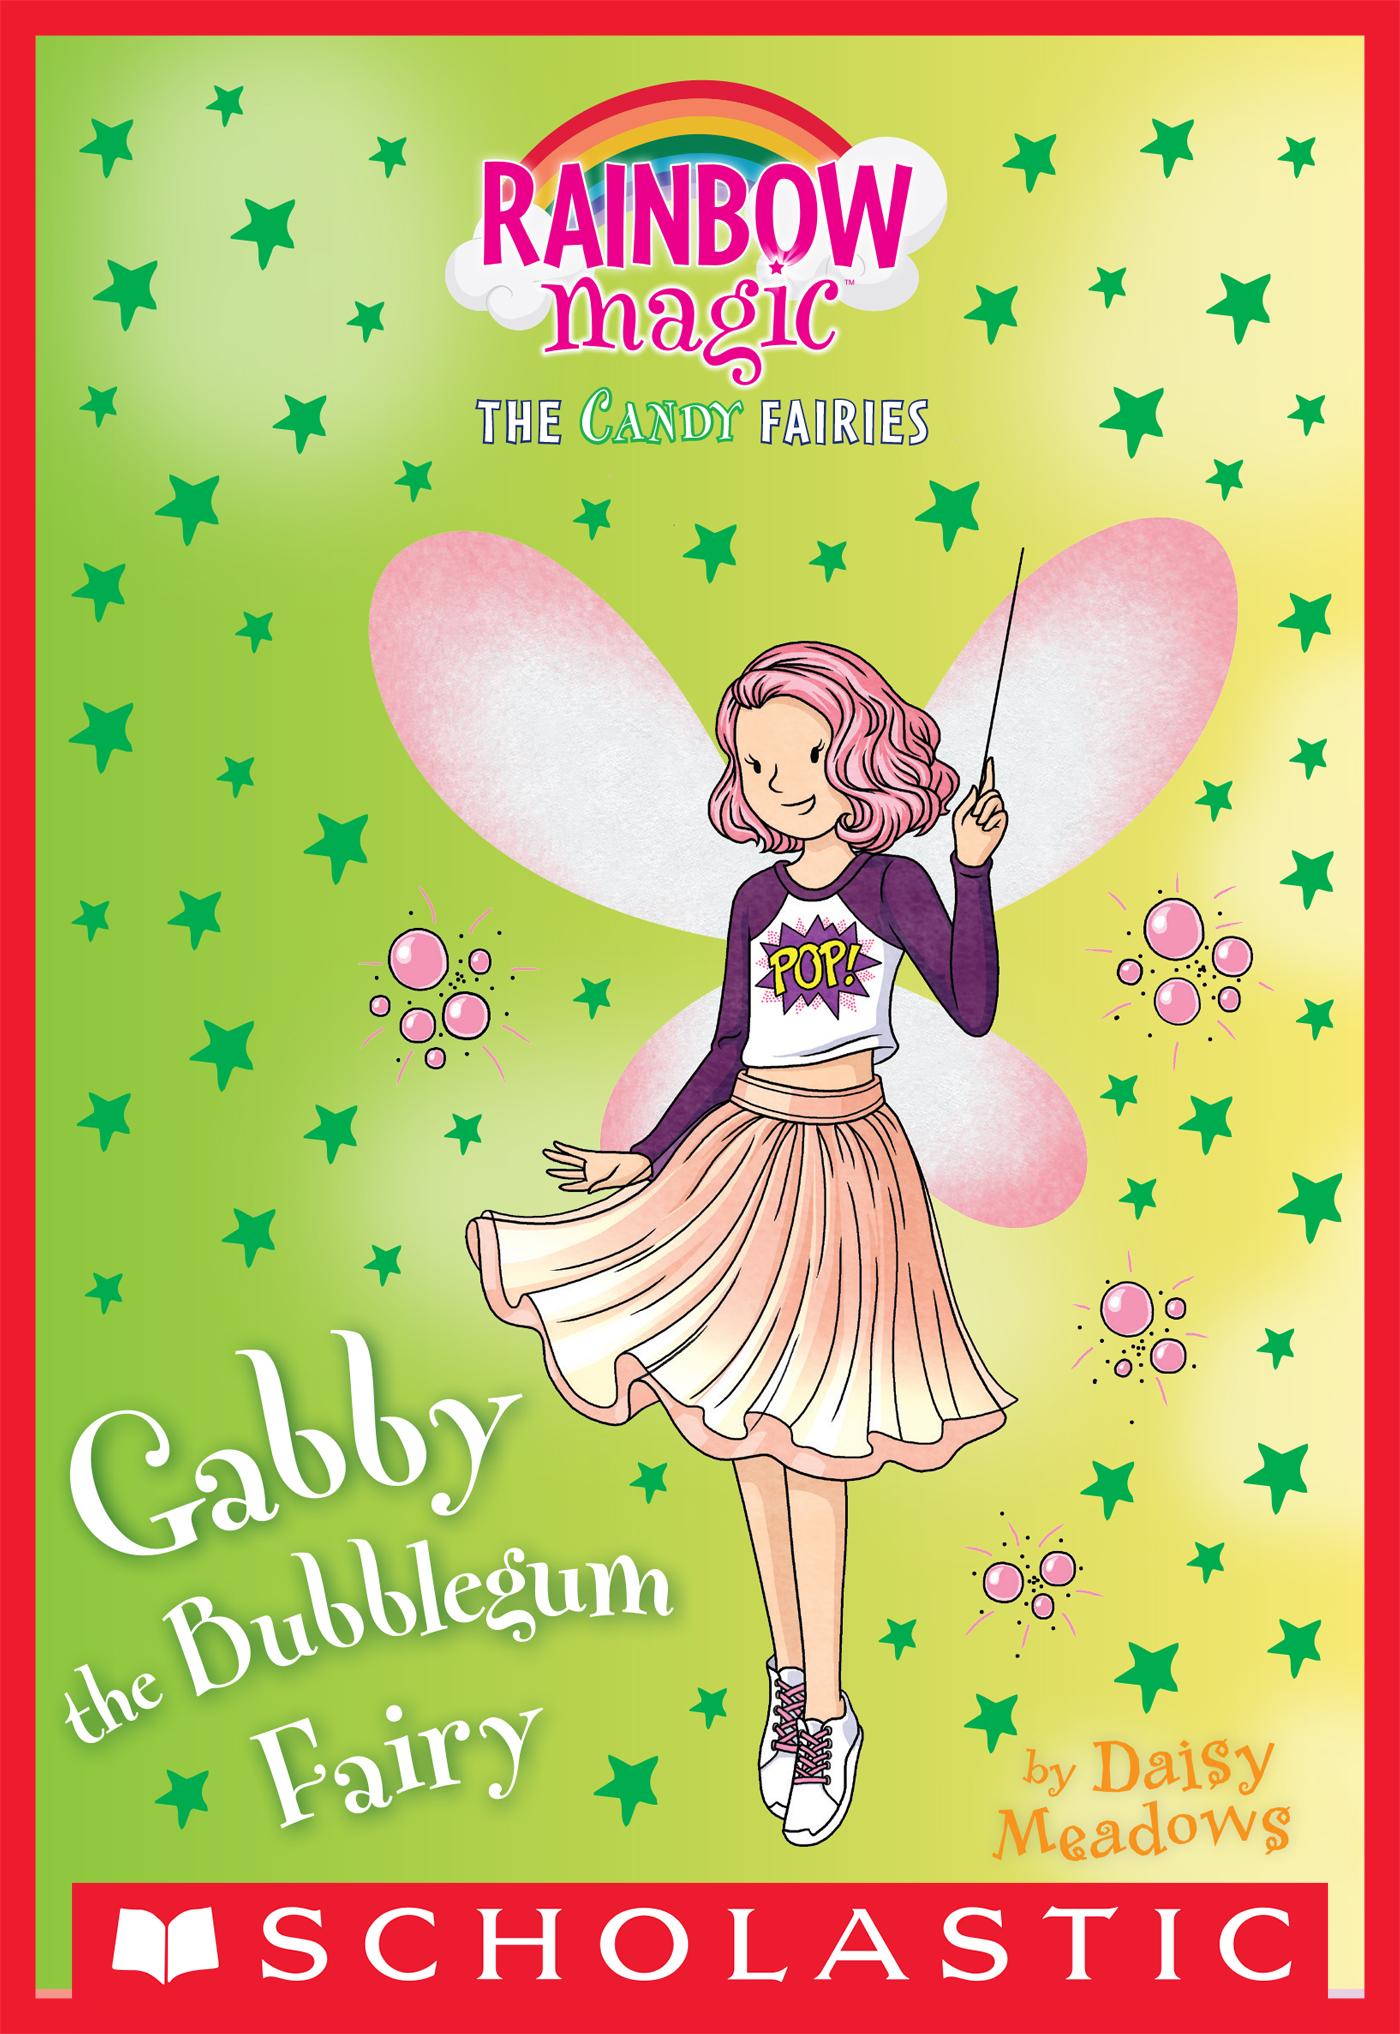 Gabby the Bubble Gum Fairy: A Rainbow Magic Book (The Sweet Fairies #2)